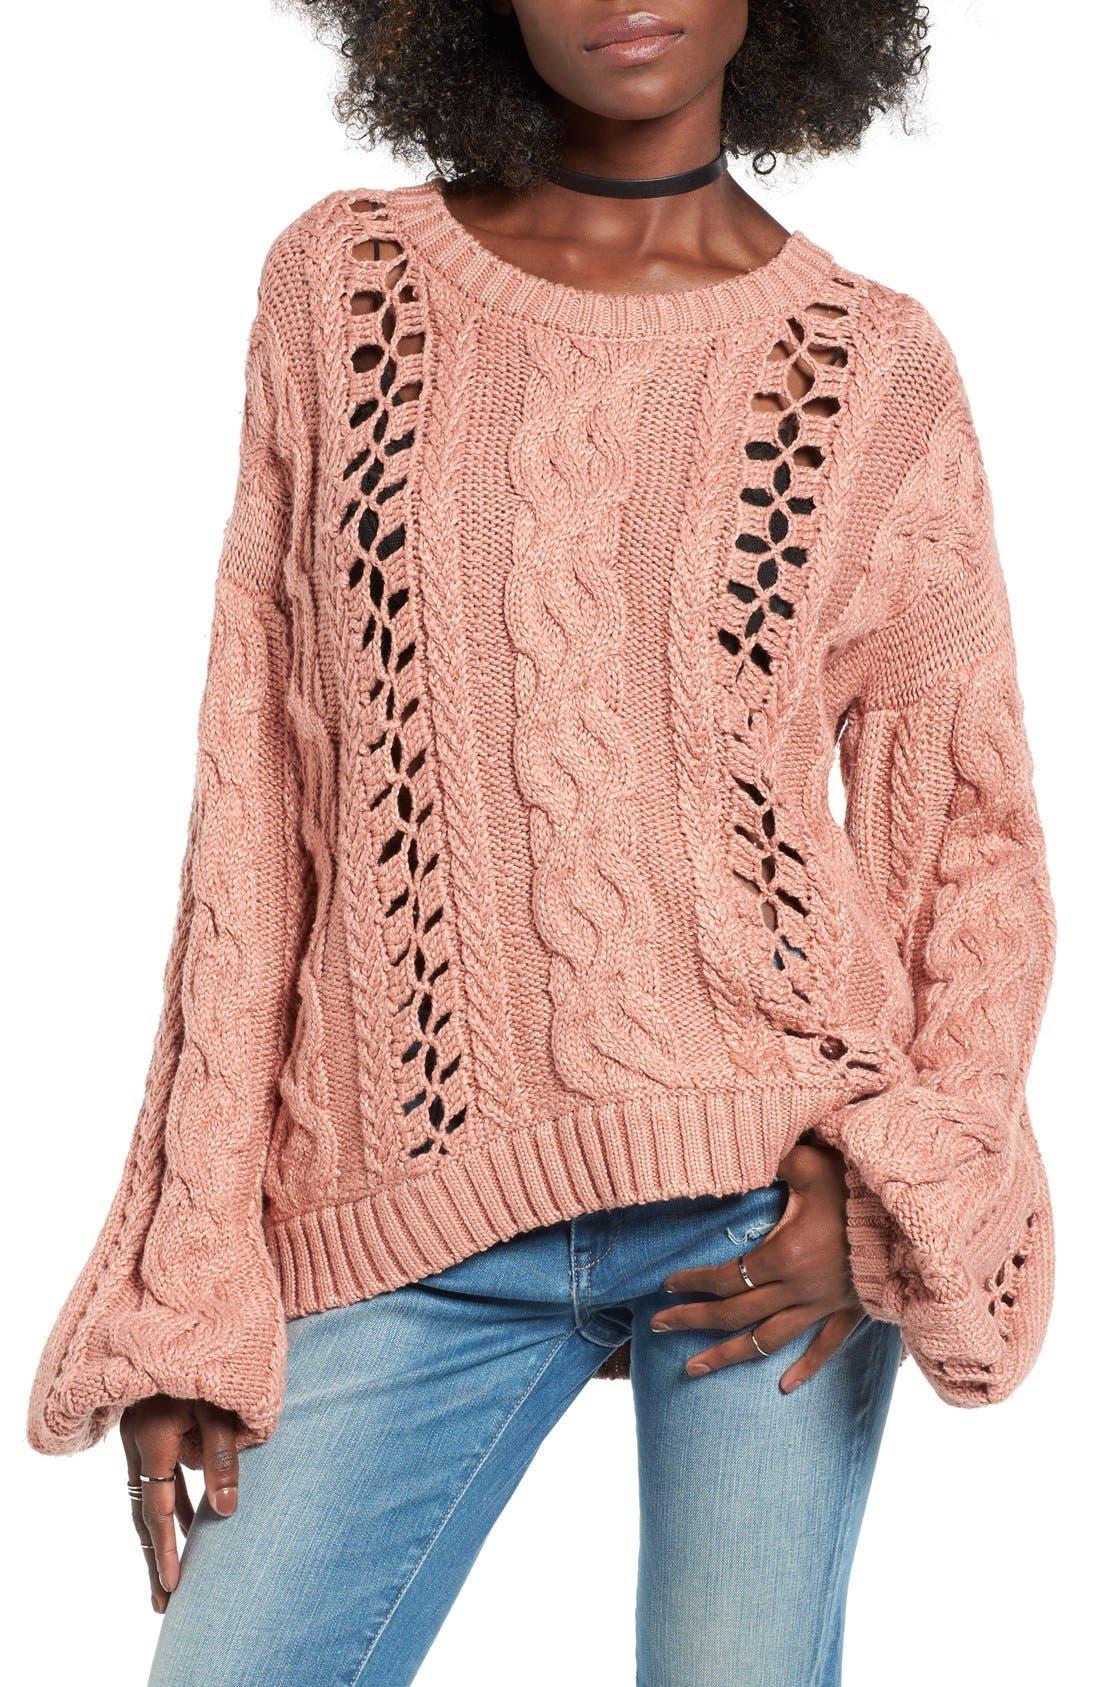 Main Image - For Love & Lemons Wythe Openwork Bell Sleeve Sweater